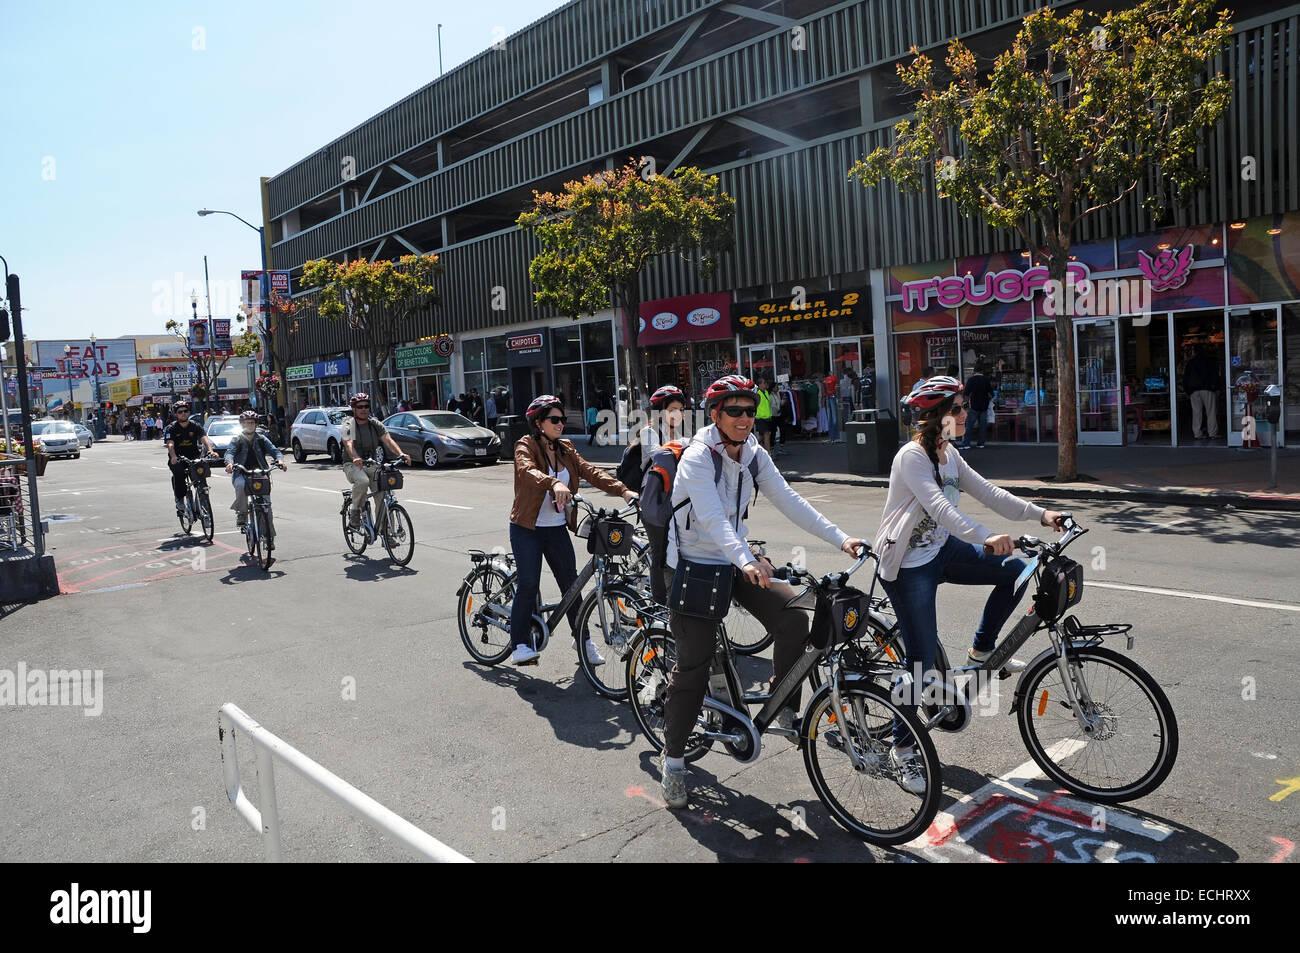 Excursión en bicicleta en las calles de San Francisco, California Imagen De Stock